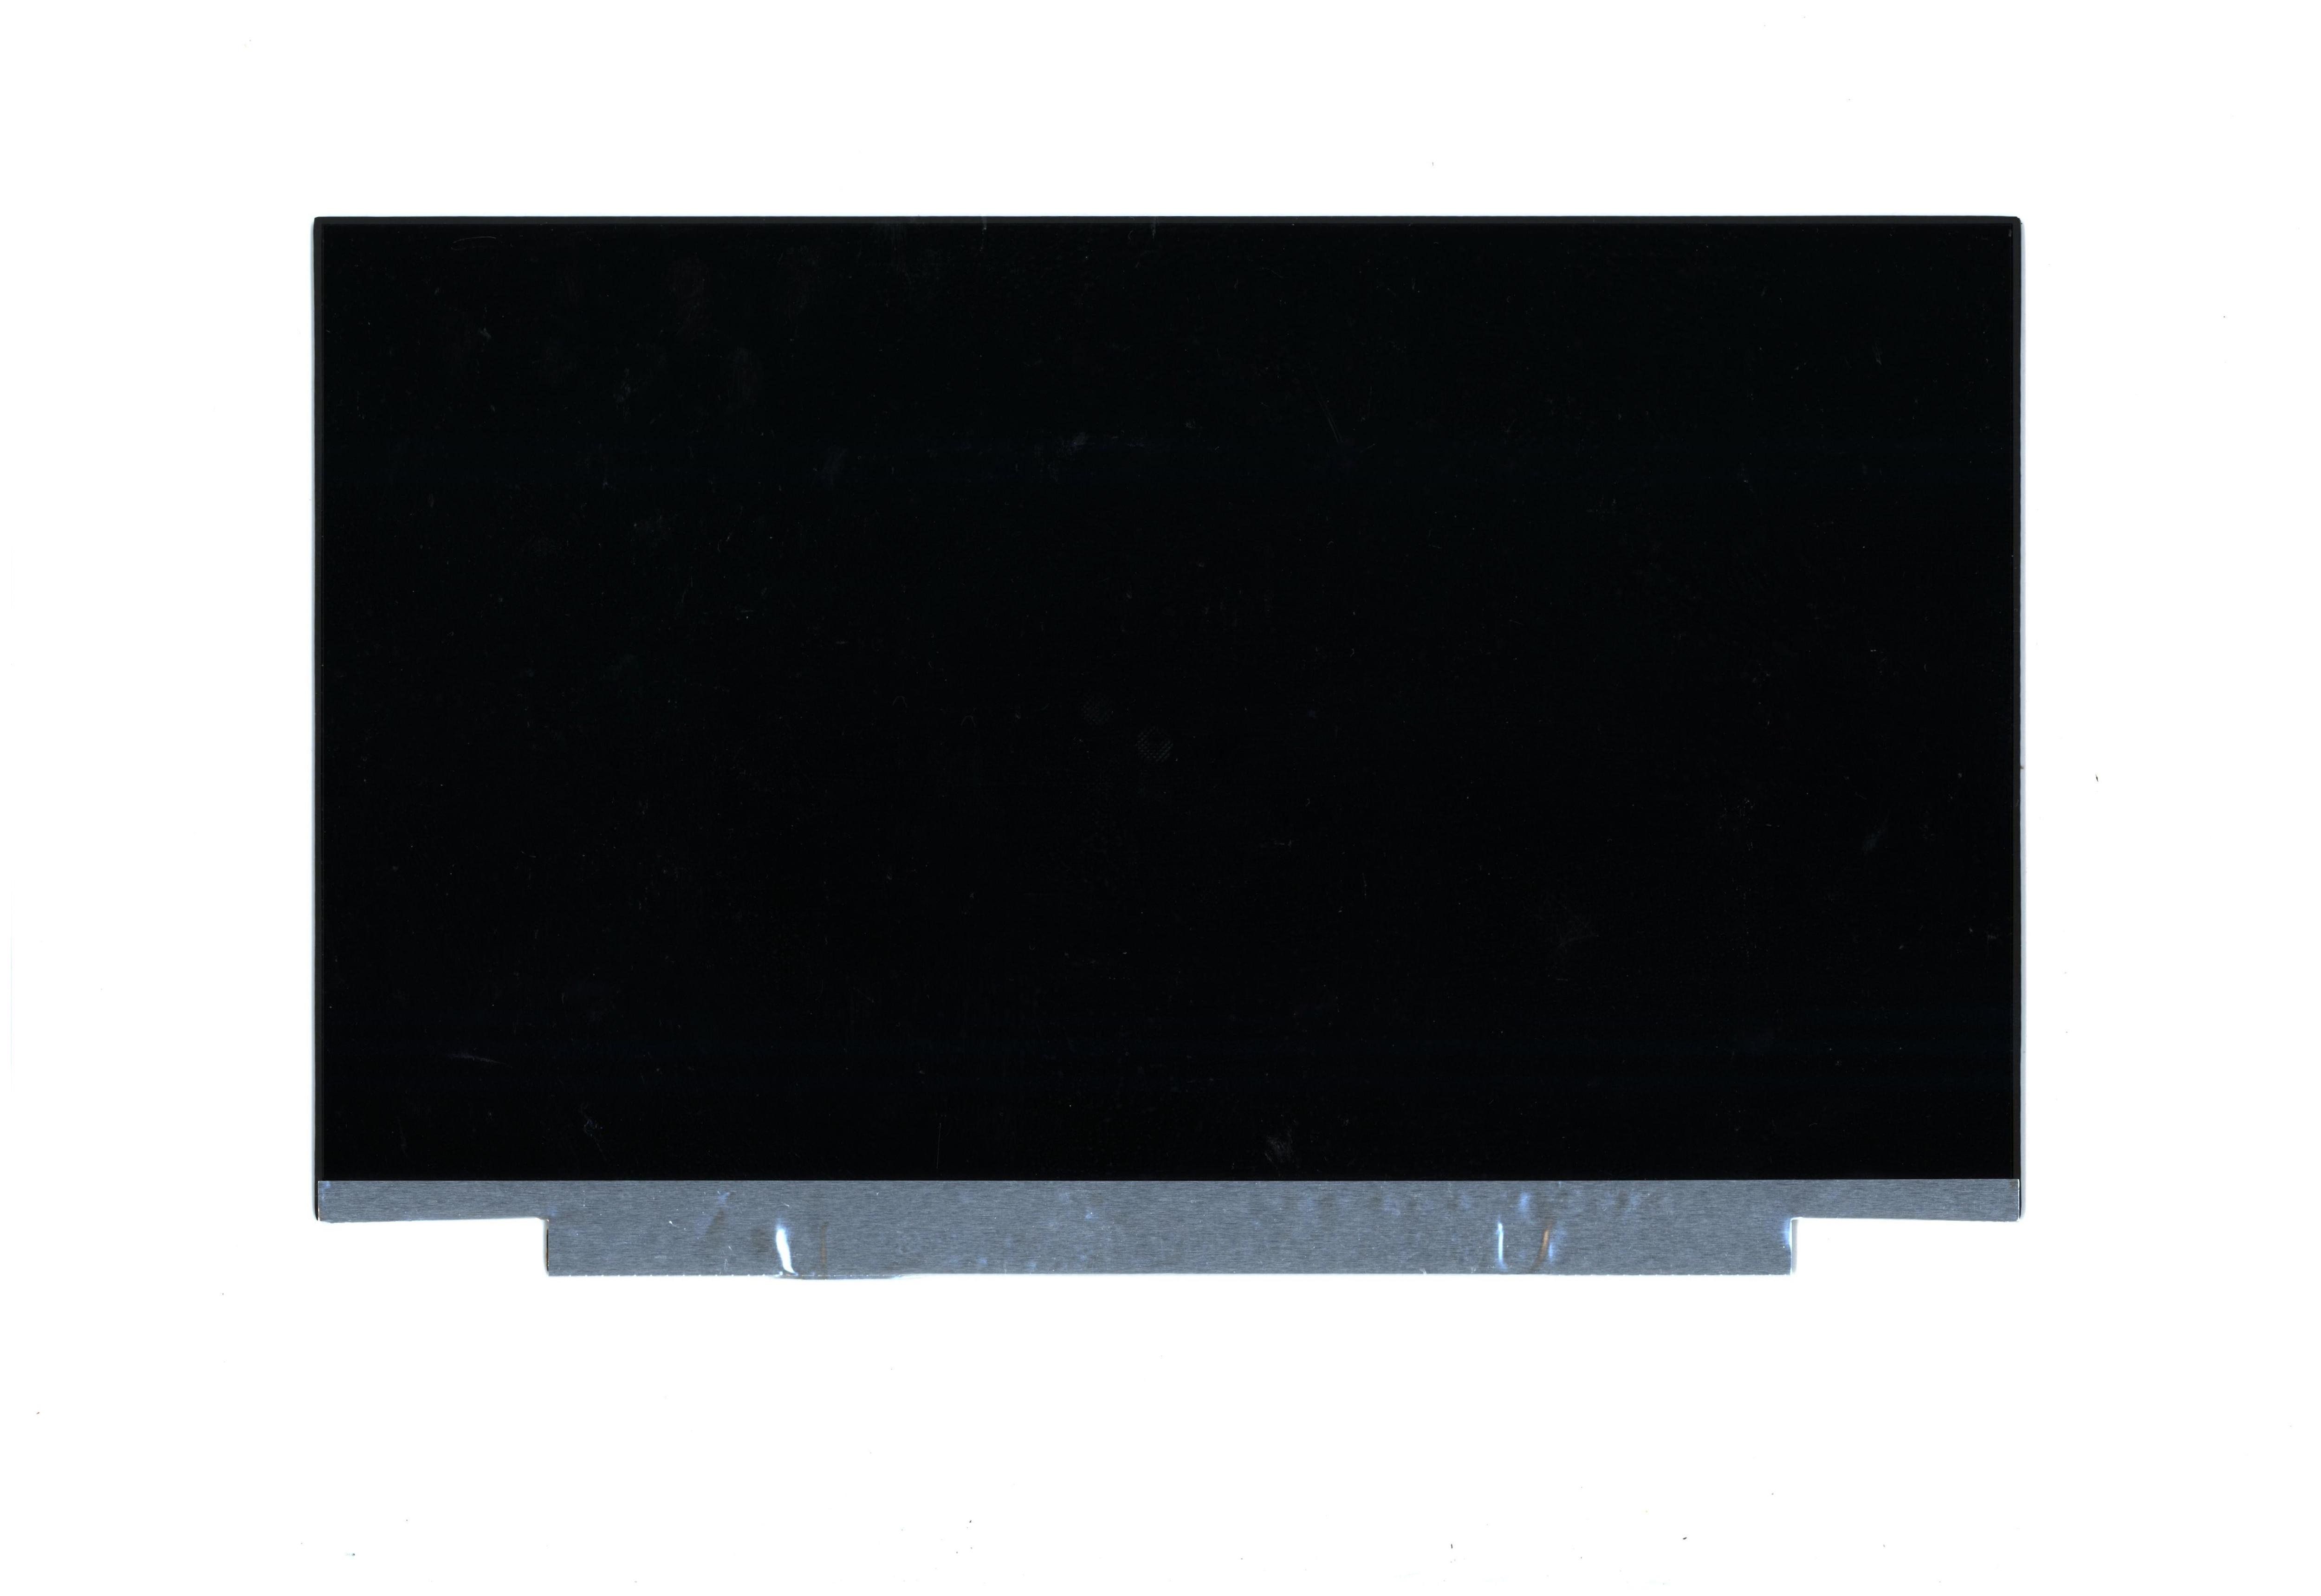 Nuevo y Original portátil Lenovo Thinkpad X1 carbono 7th T480 T480s pantalla LCD 2560*1440 mate WQHD IPS 40pin 00NY664